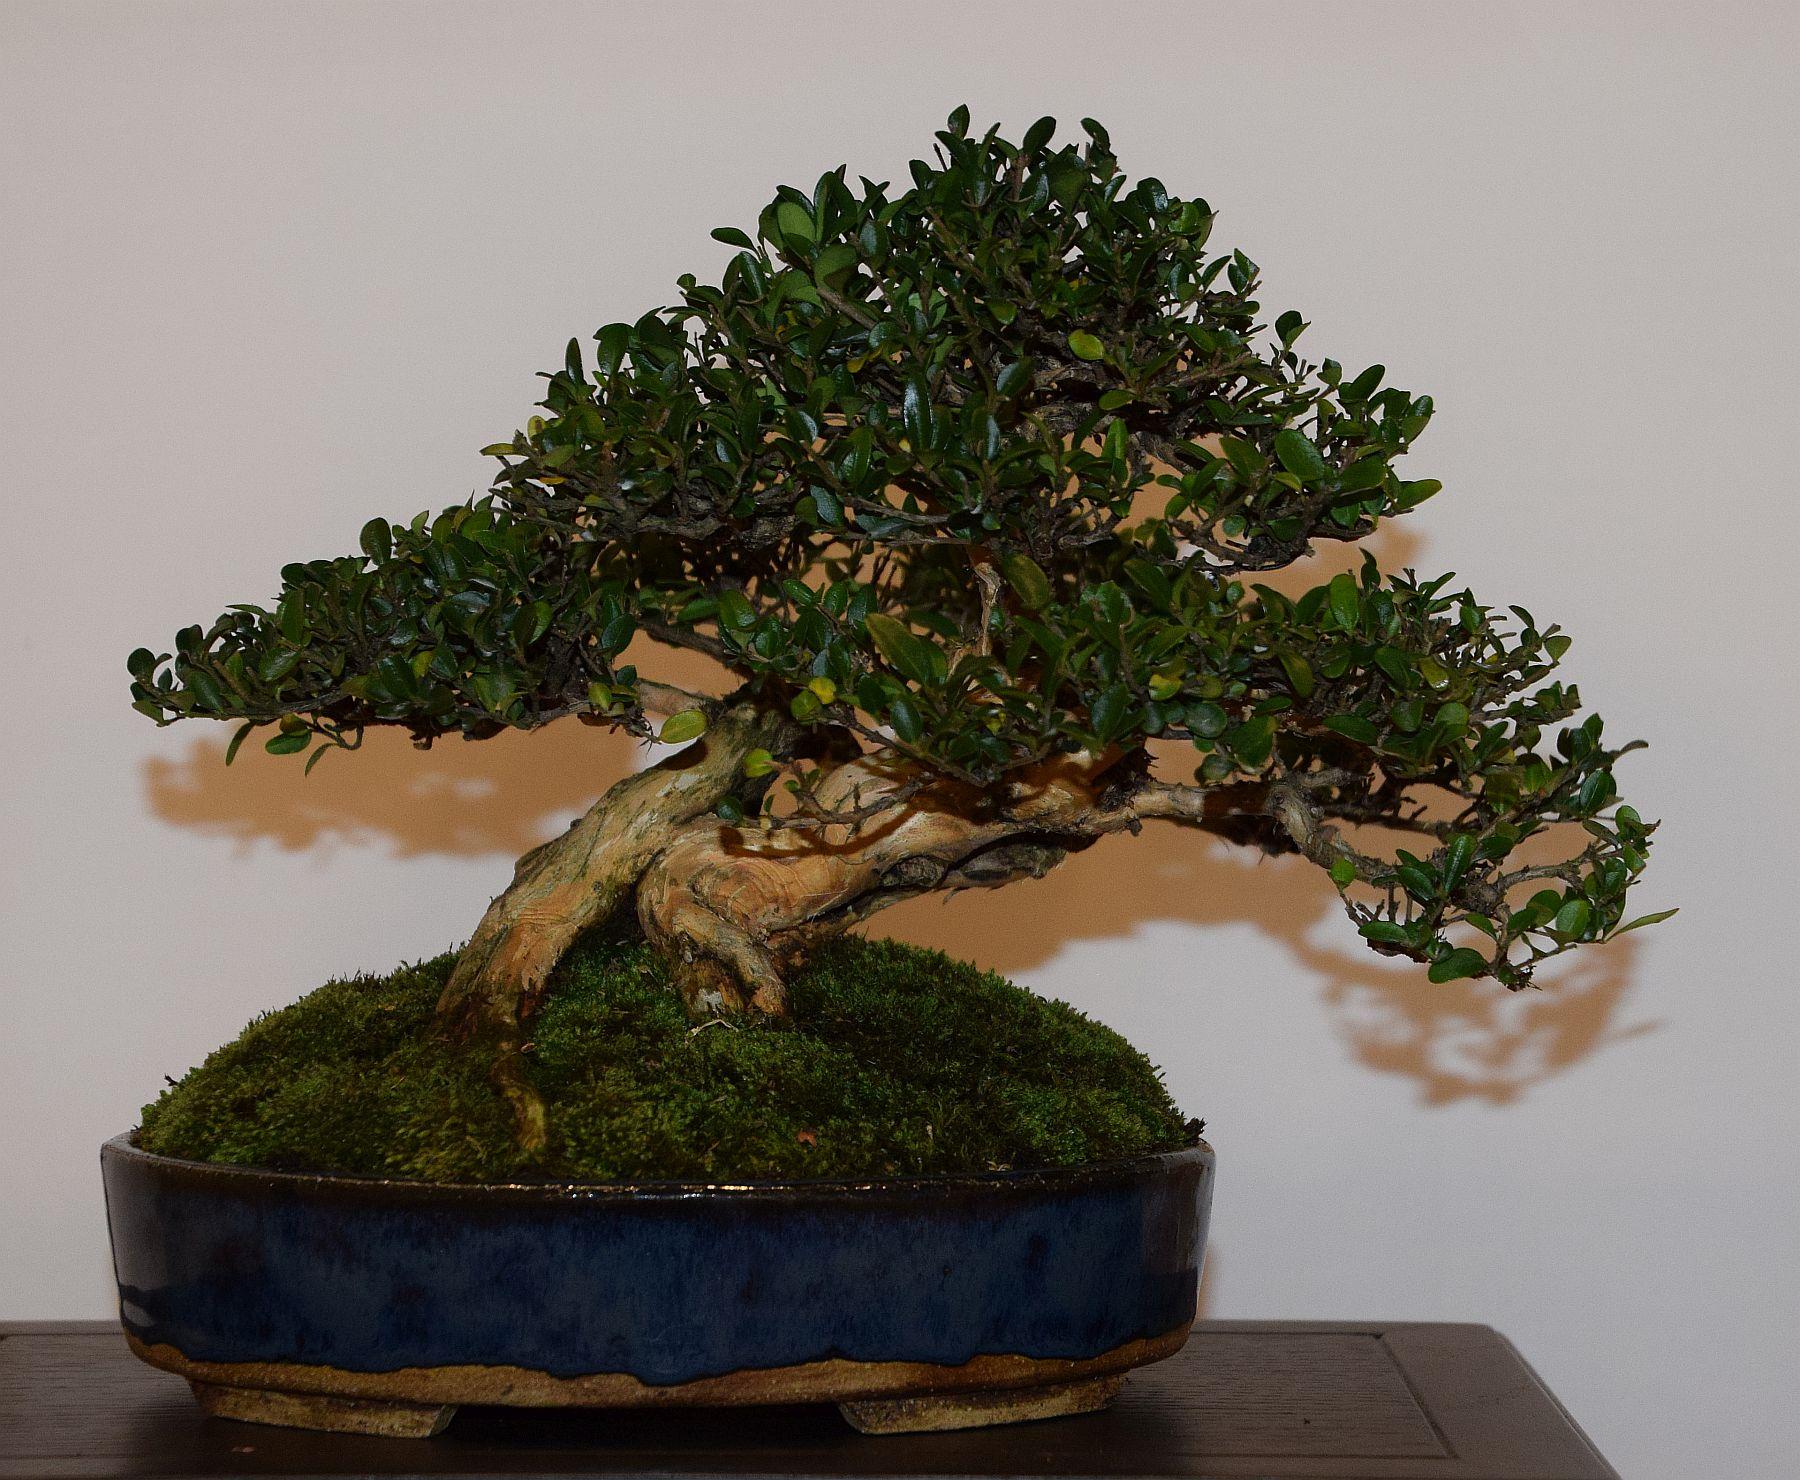 euk-bonsai-ten-2016-club-bonsai-103